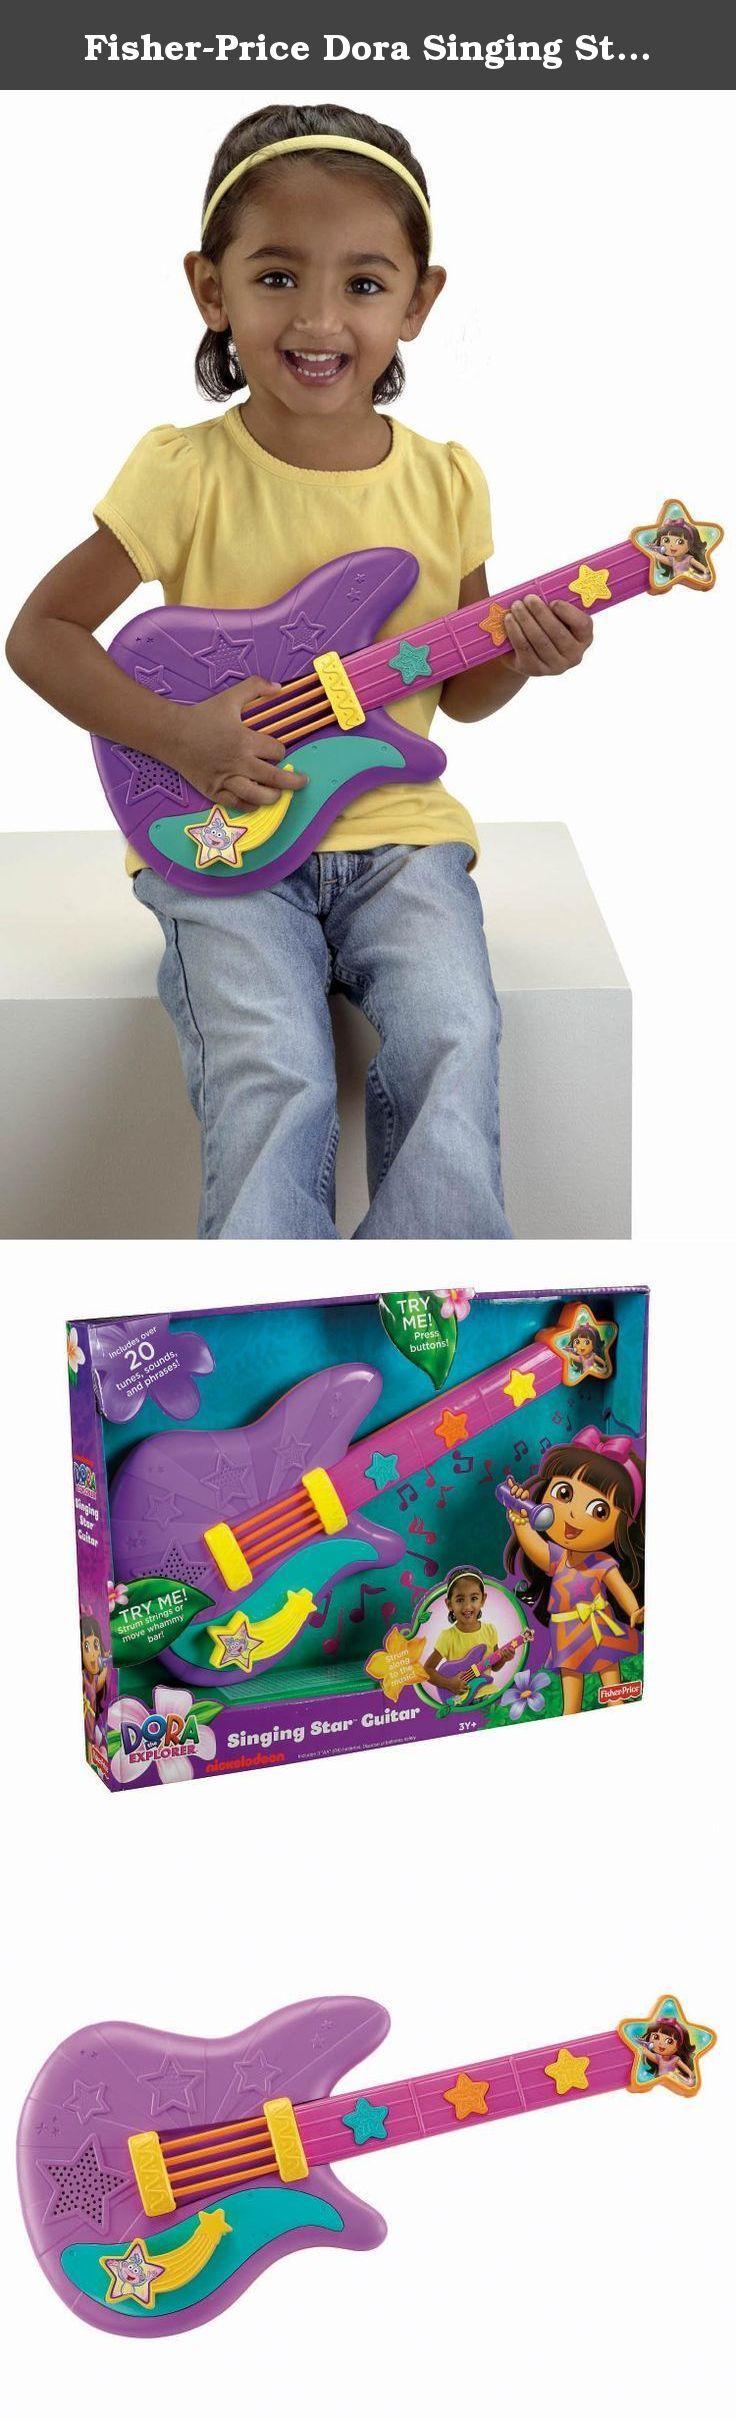 Fisher-Price Dora Singing Star Guitar. Fisher-Price Dora Singing Star Guitar.